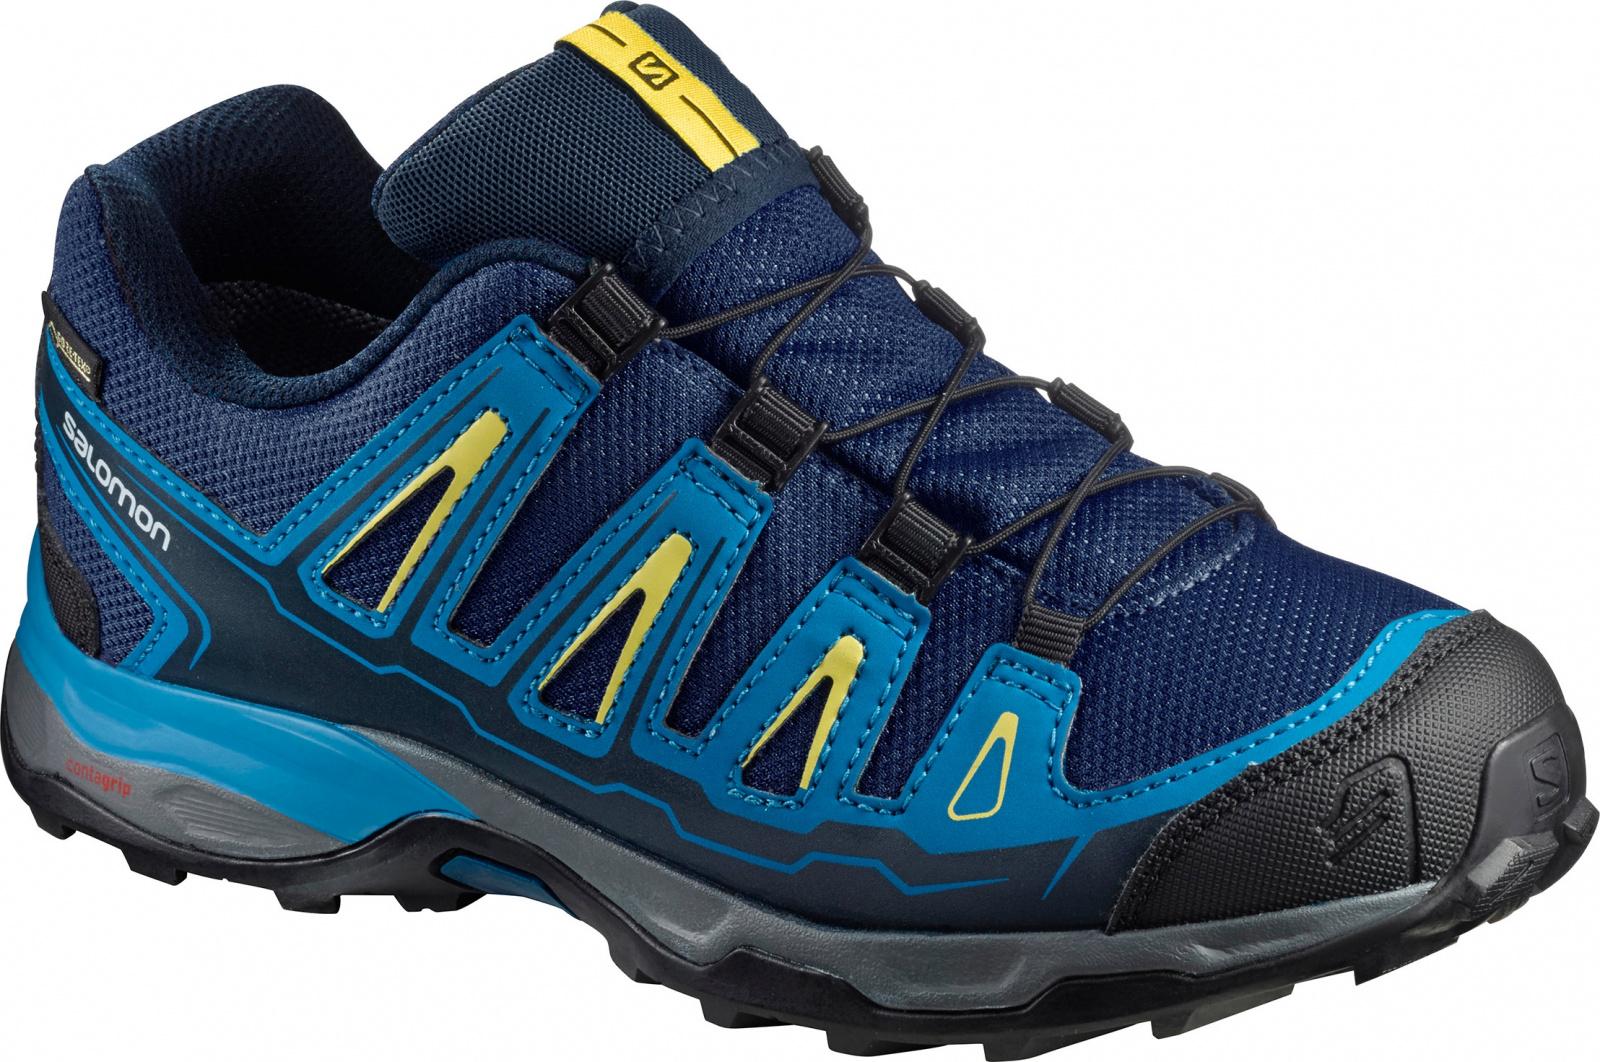 Salomon X-ultra GTX EU 34, Blue Depths/Cloisonné/Blazing Yellow Dětské boty